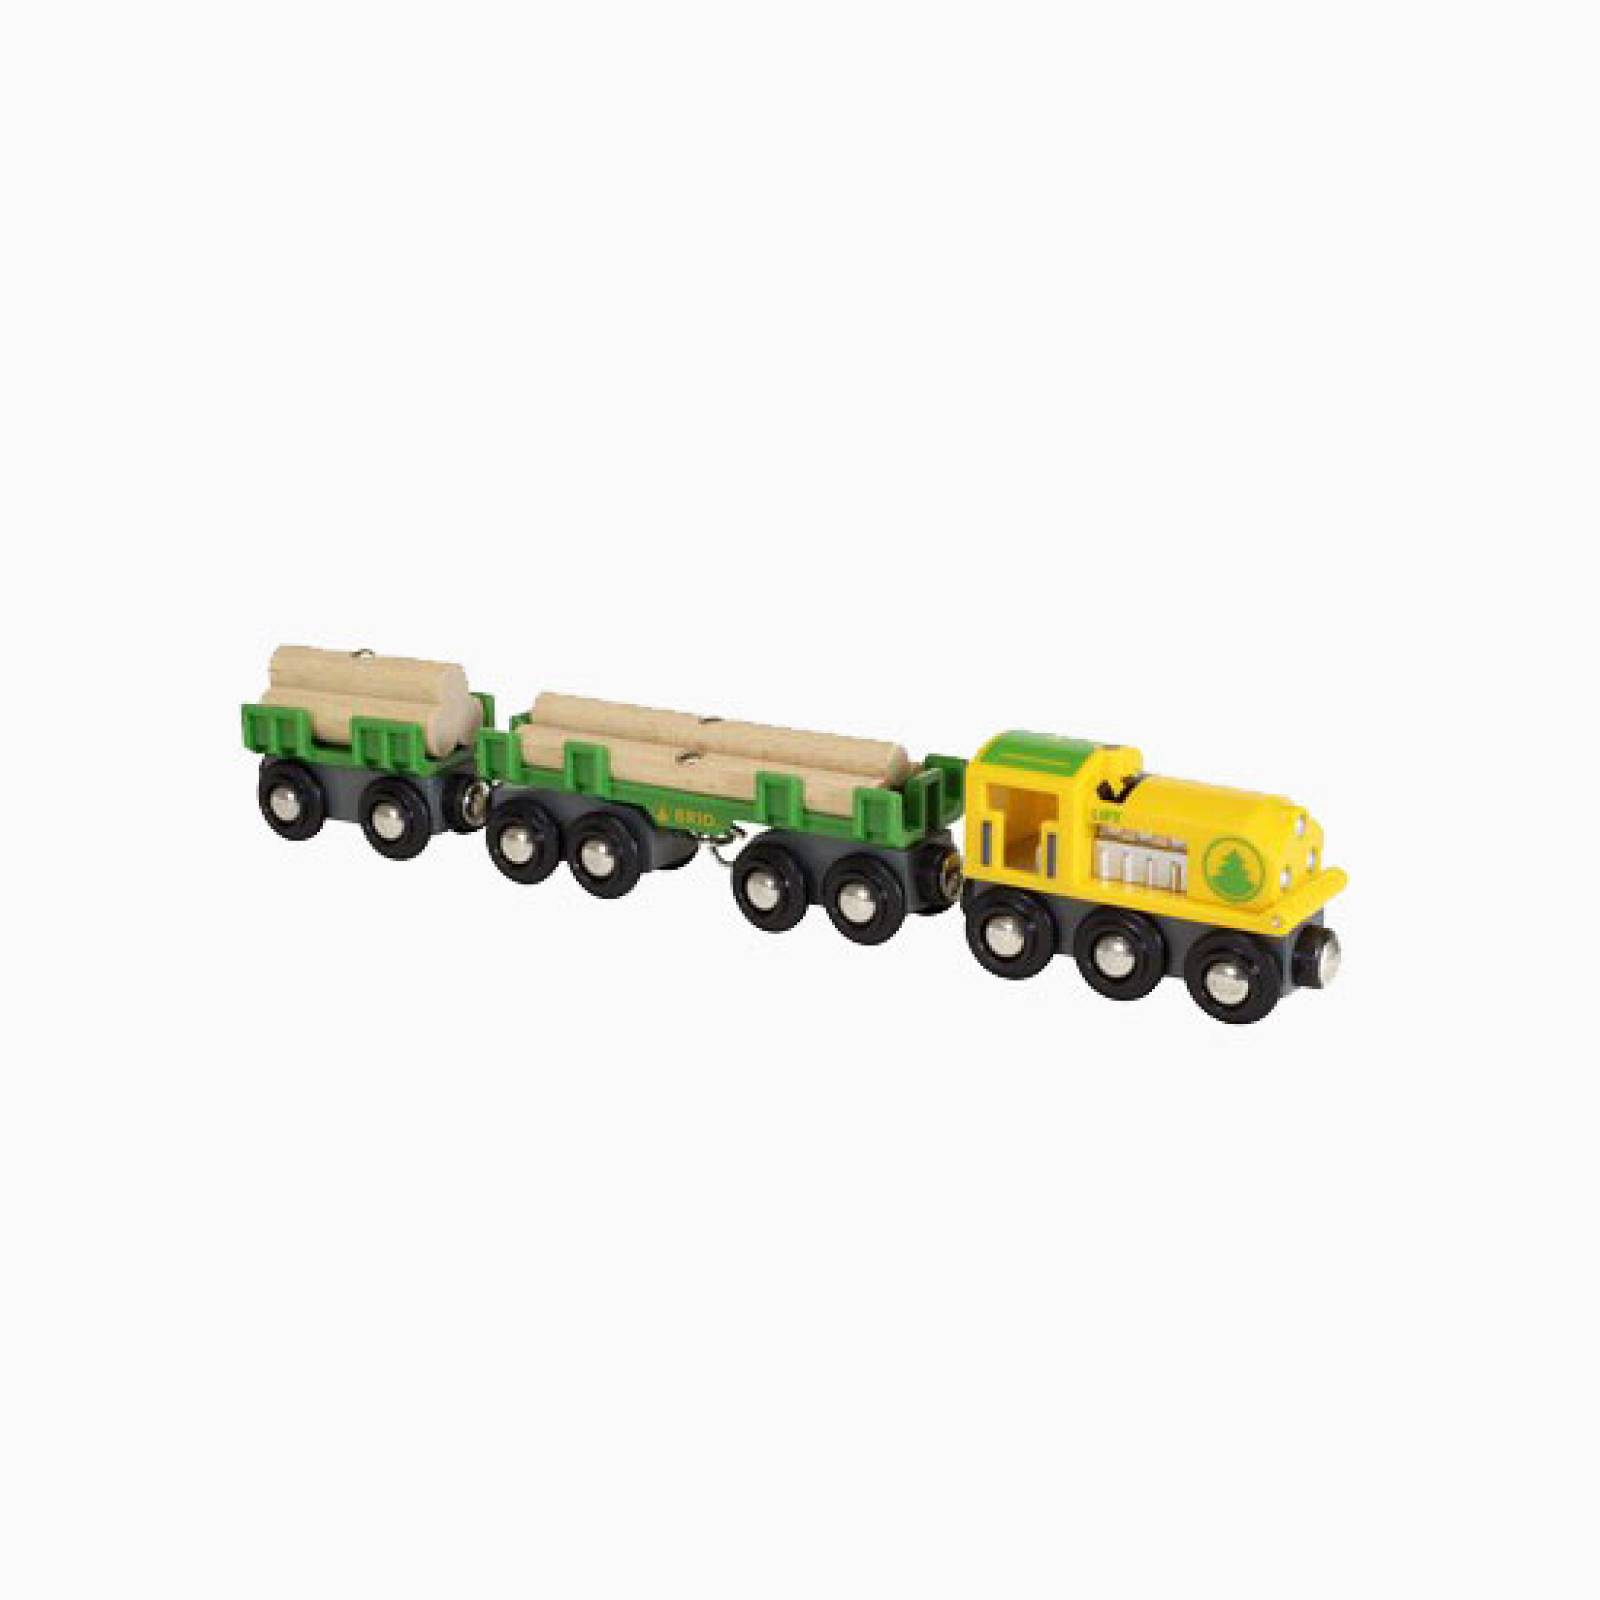 Lumber Train BRIO Wooden Railway Age 3+